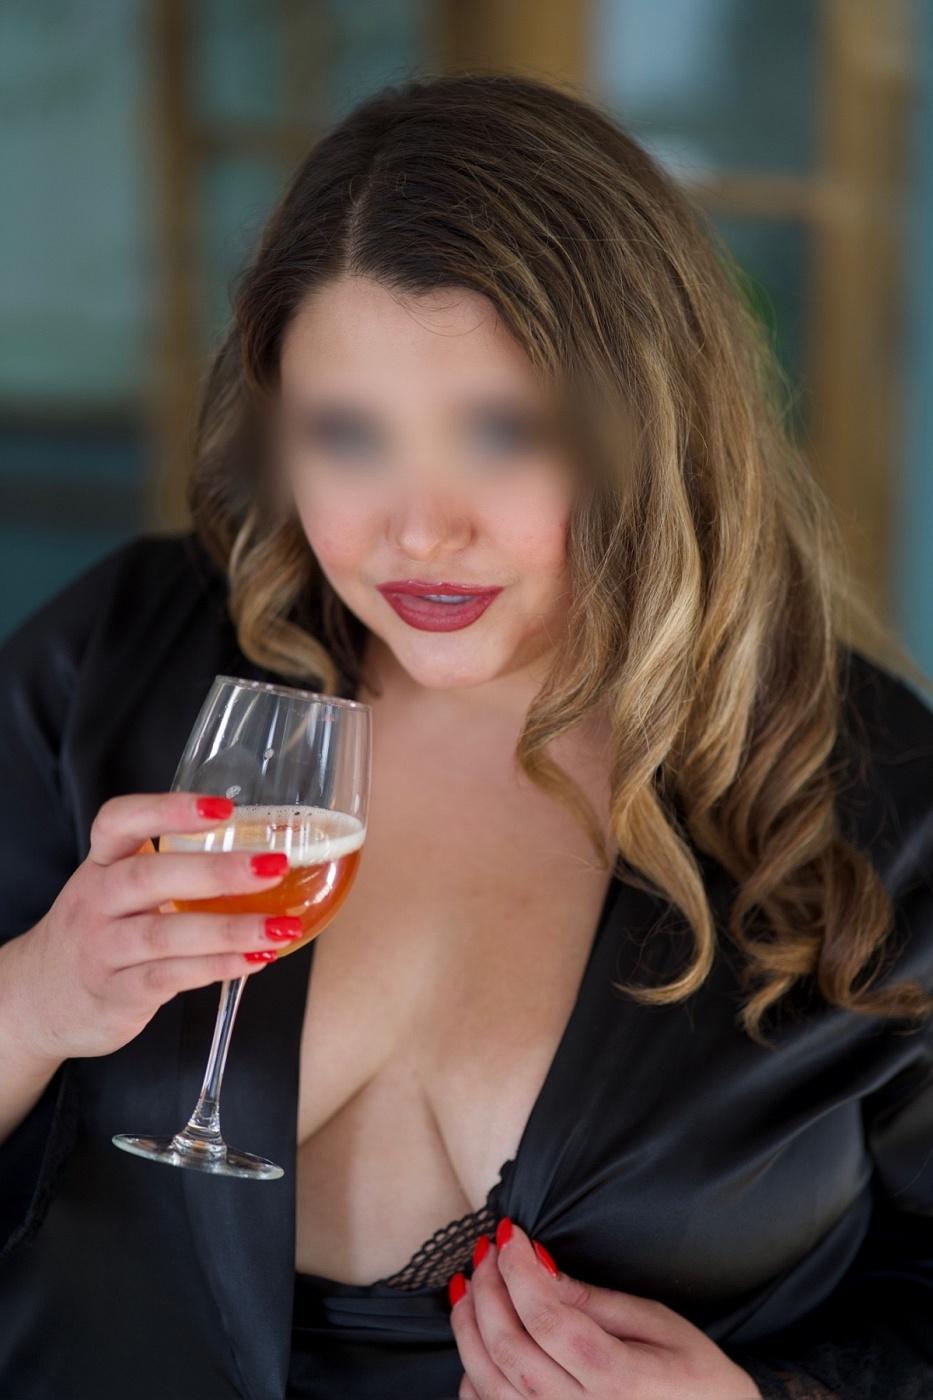 PornStar Lexie Foxx